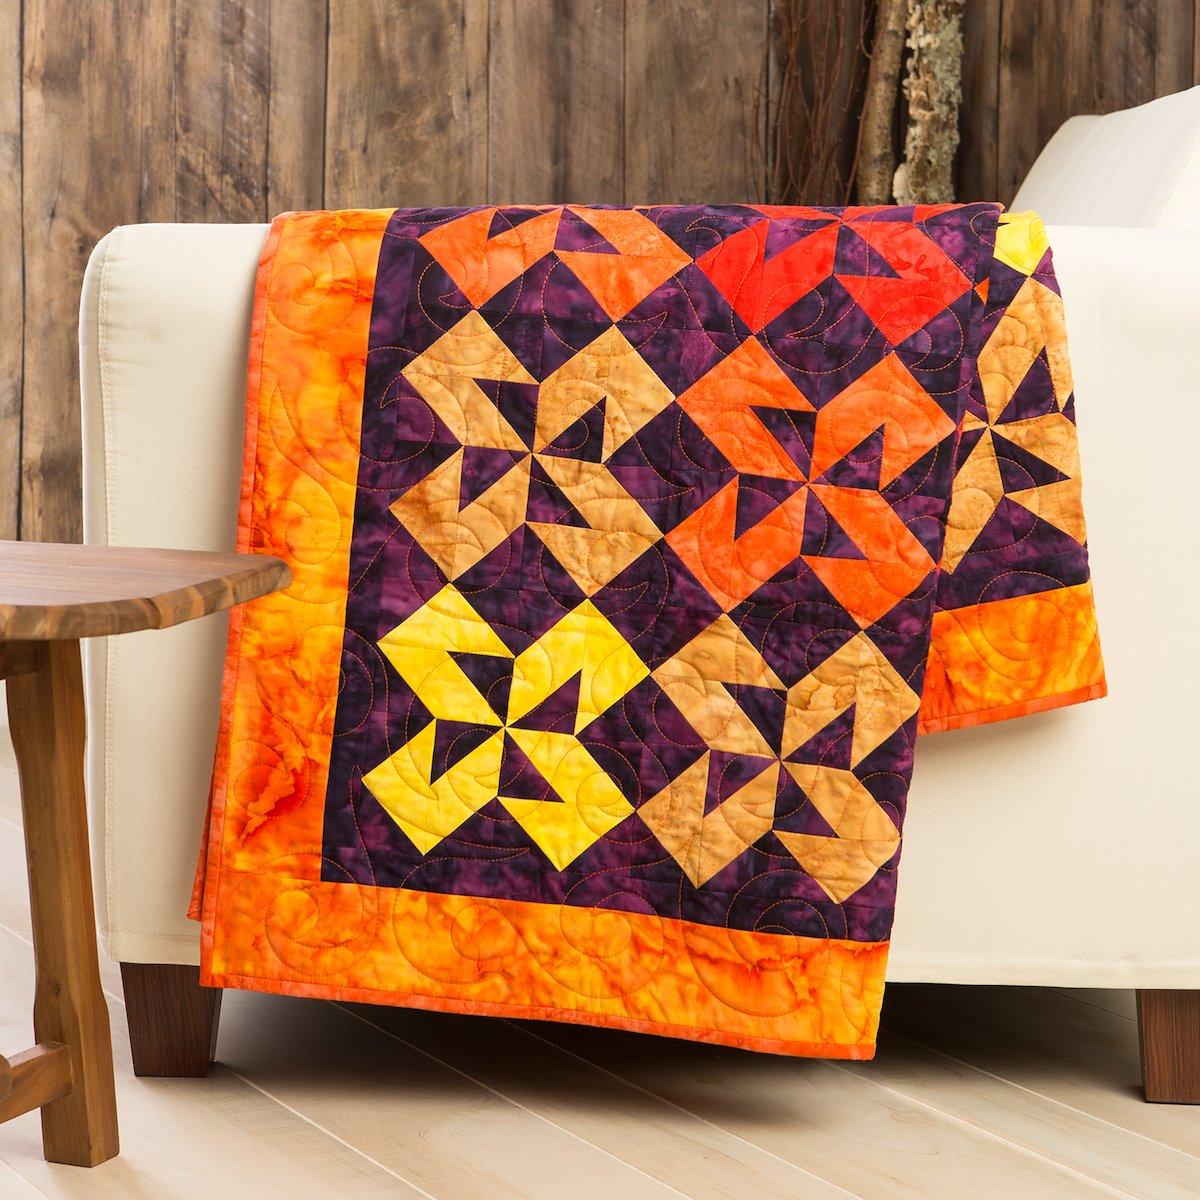 PQ11480-colorado-quilt-lifestyle-1500x1500